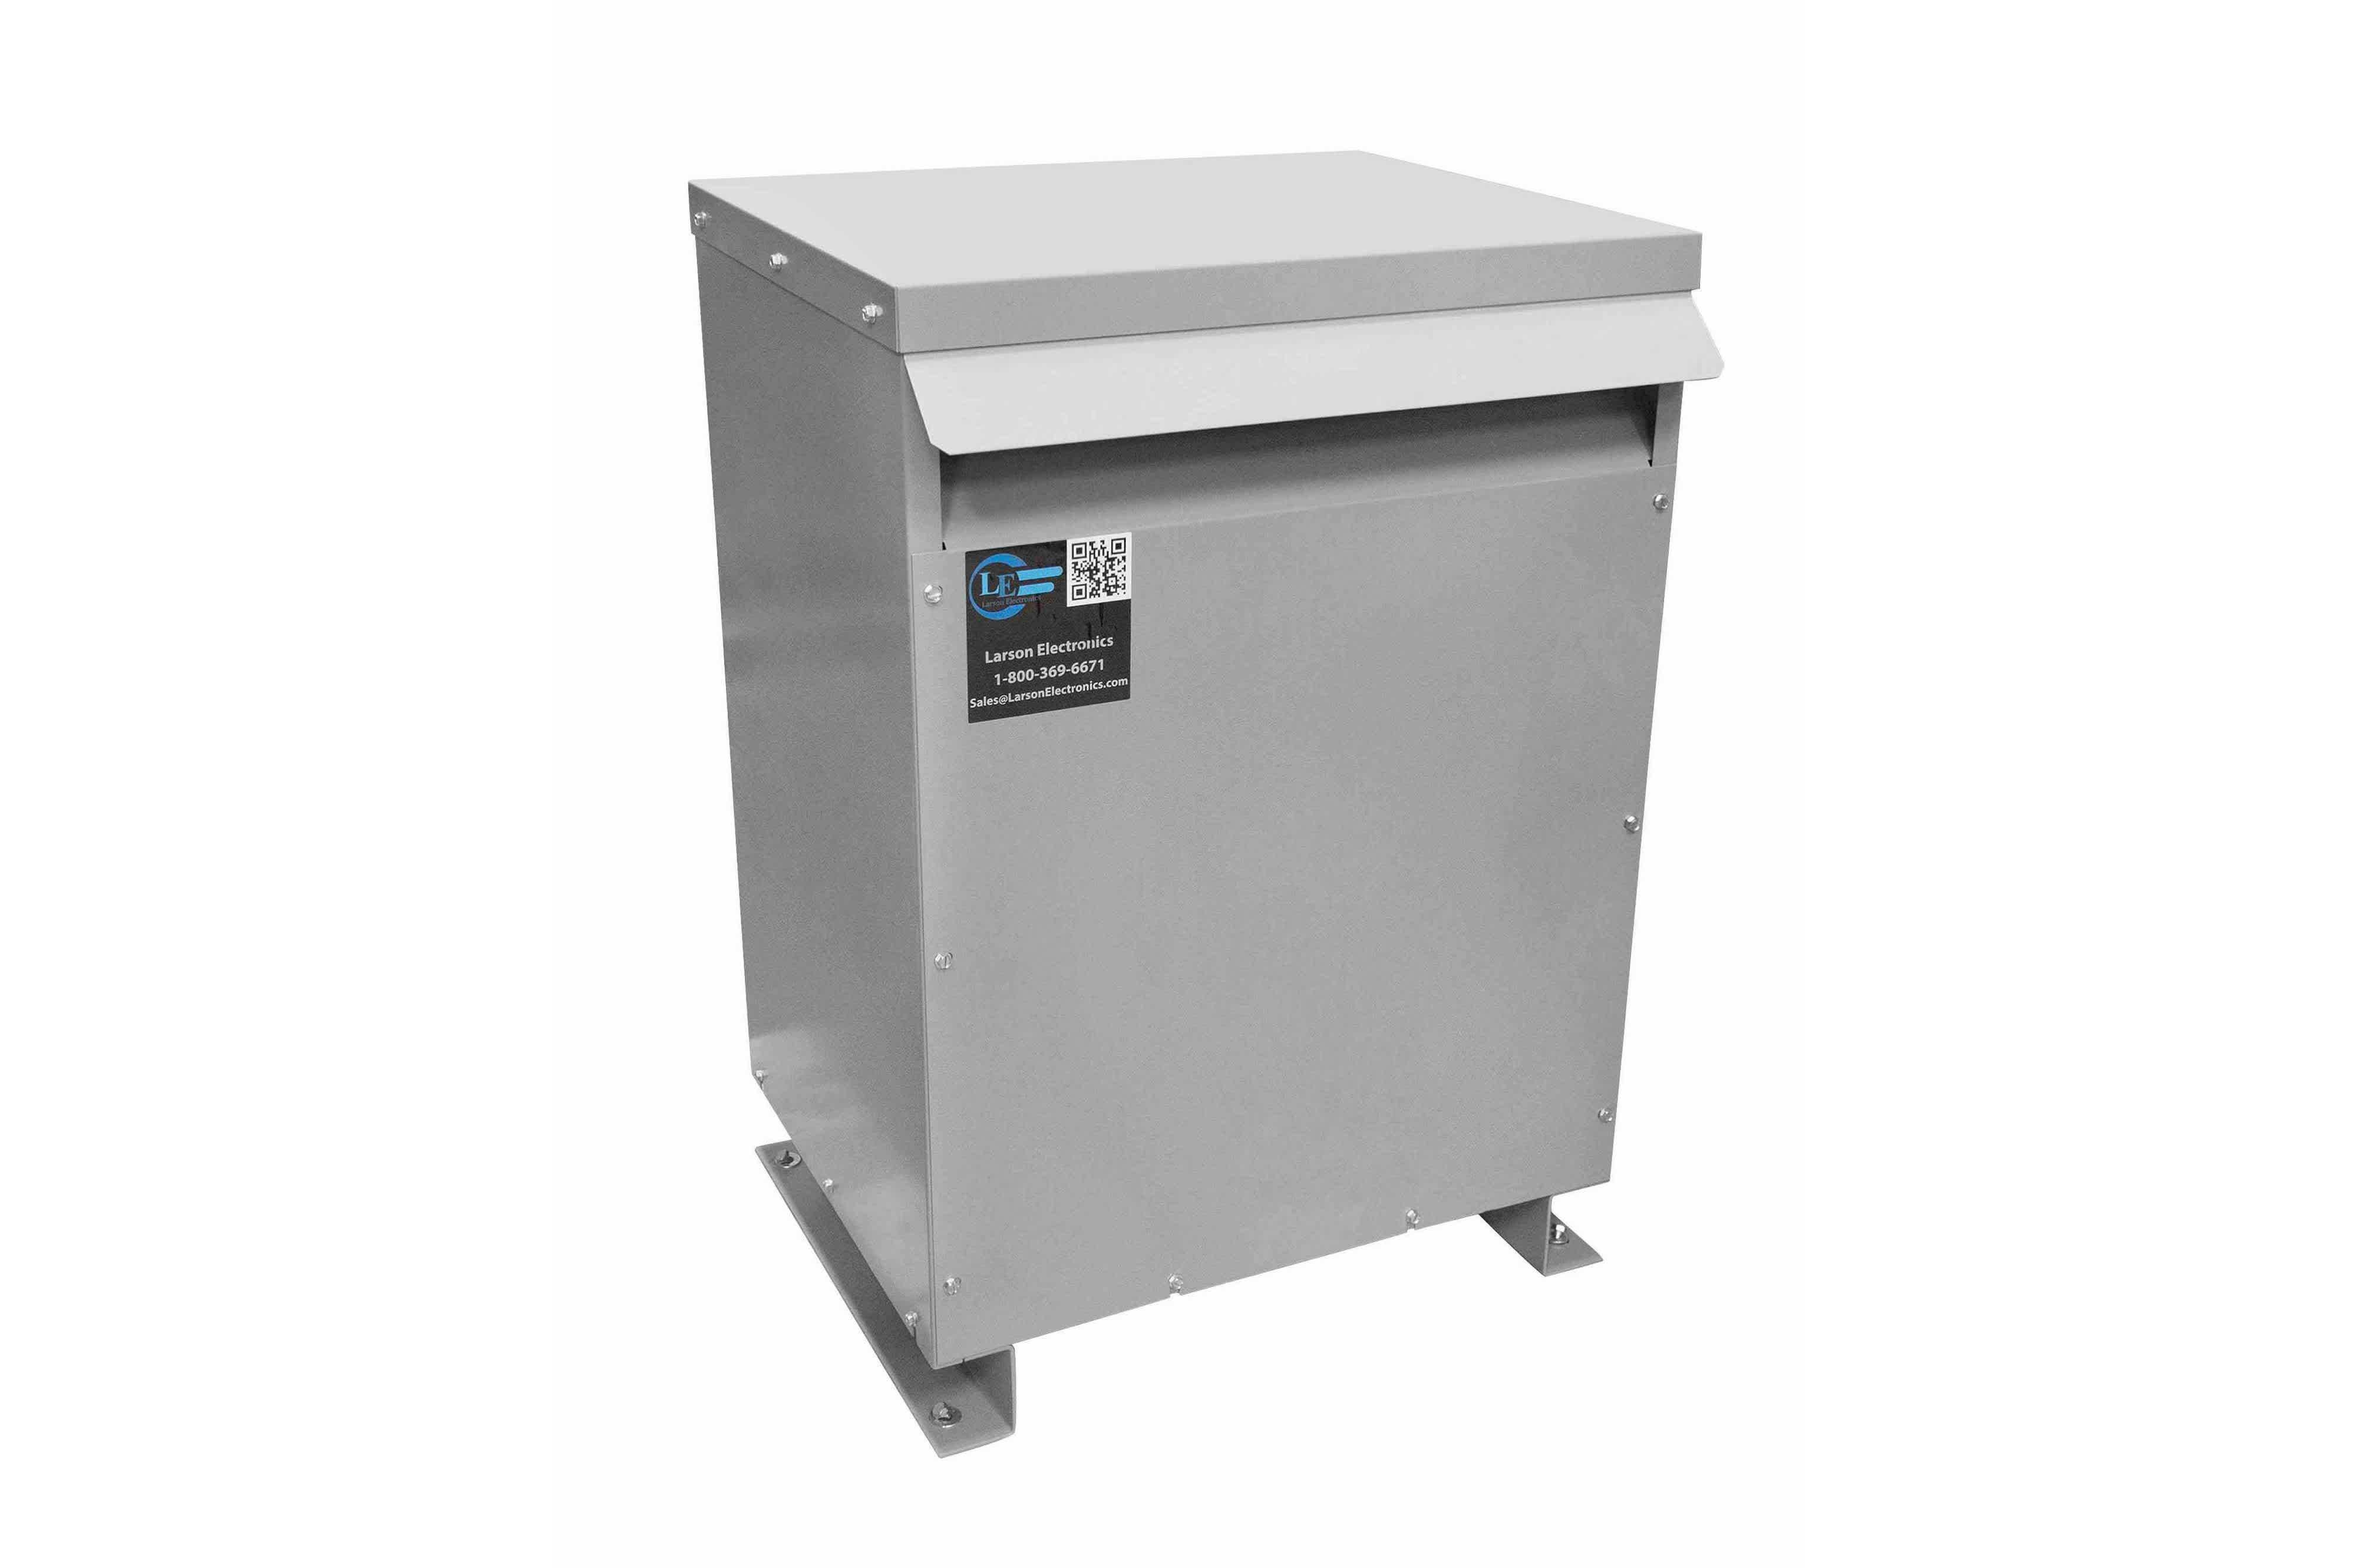 200 kVA 3PH Isolation Transformer, 575V Wye Primary, 380V Delta Secondary, N3R, Ventilated, 60 Hz